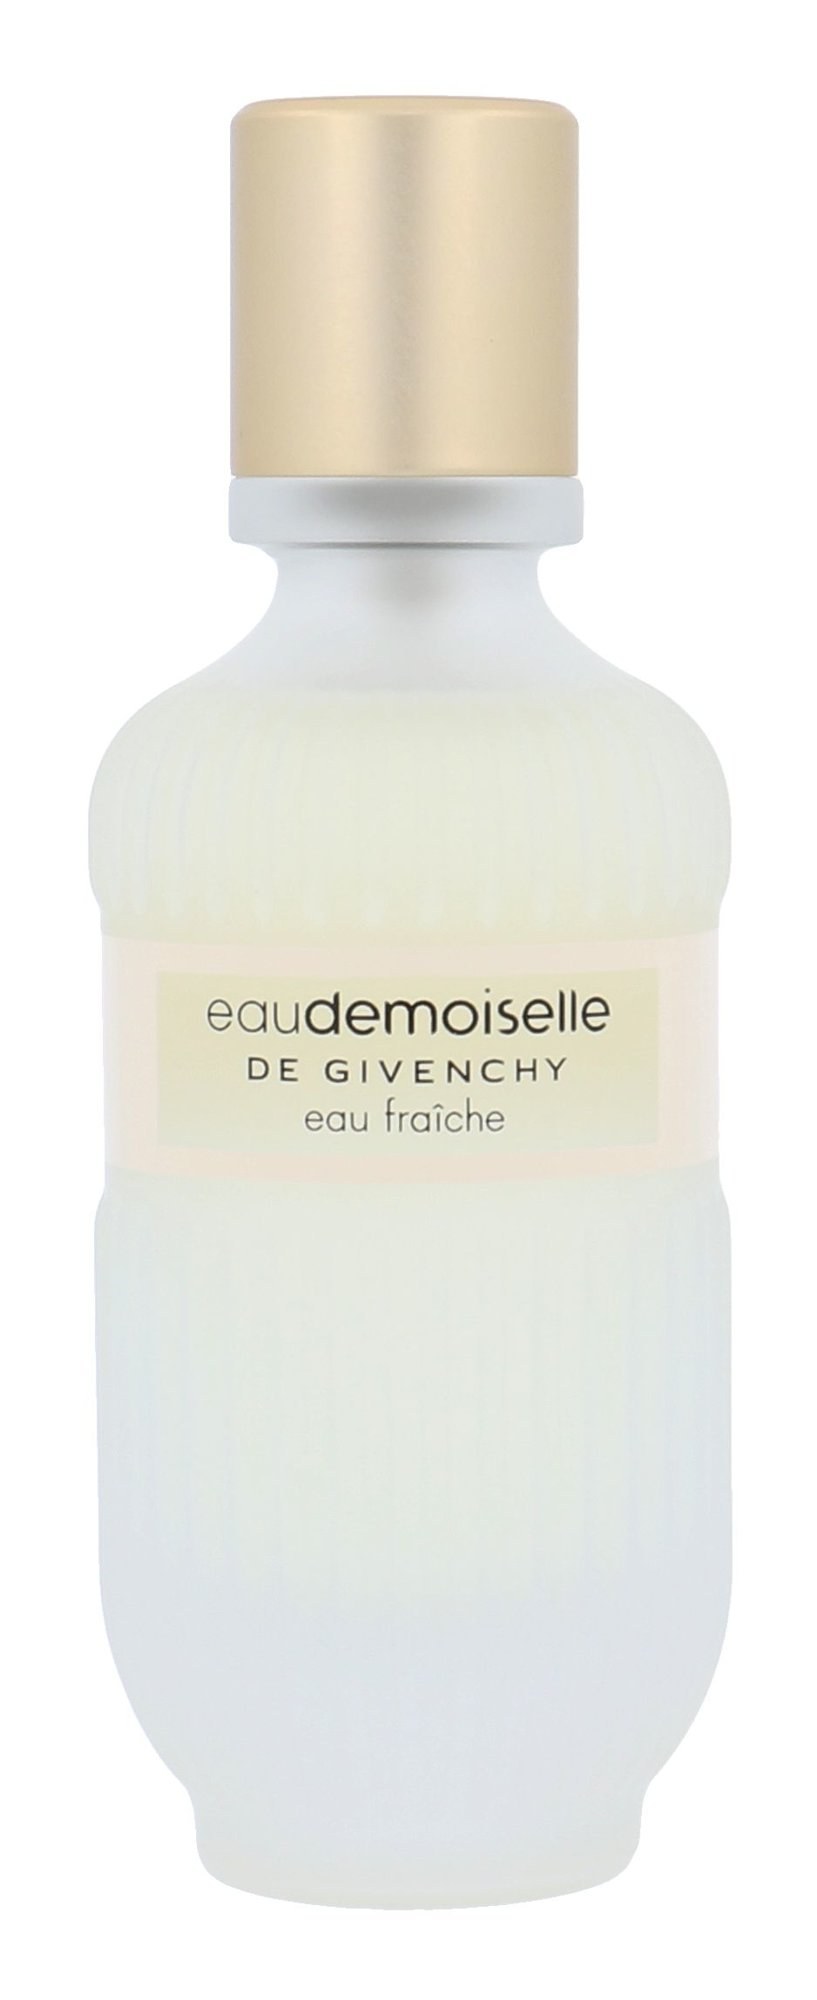 Givenchy Eaudemoiselle Eau Fraiche EDT 50ml